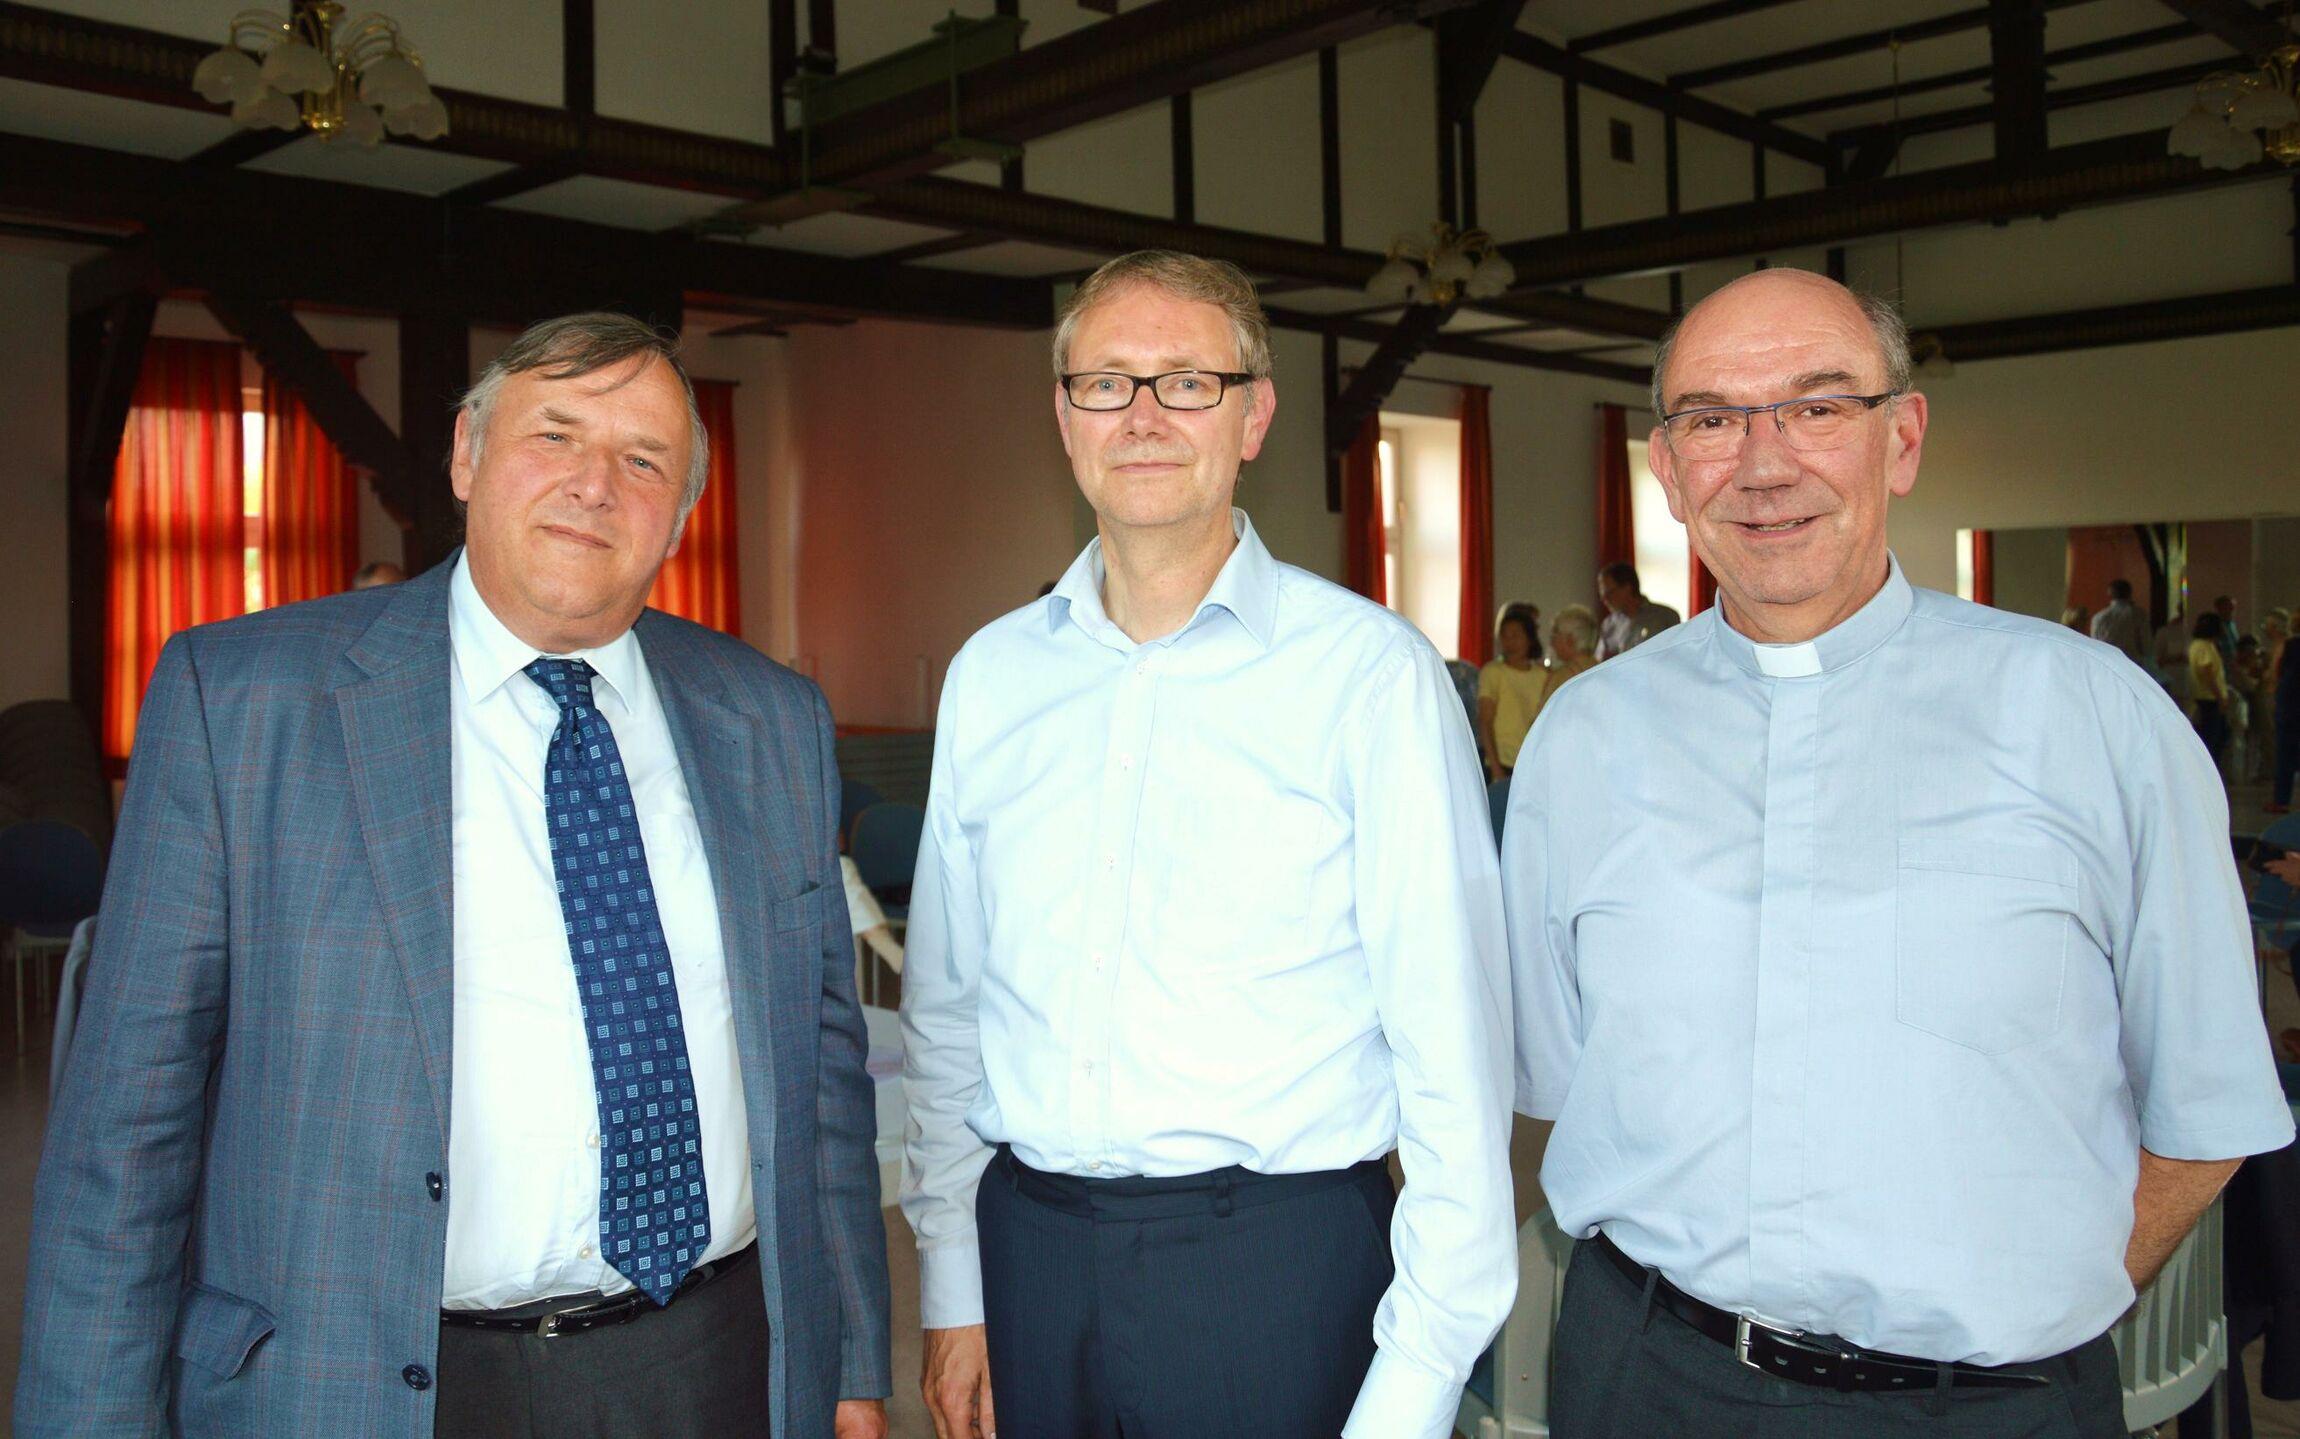 Superintendent Keil Professor Manemann Propst Galluschke